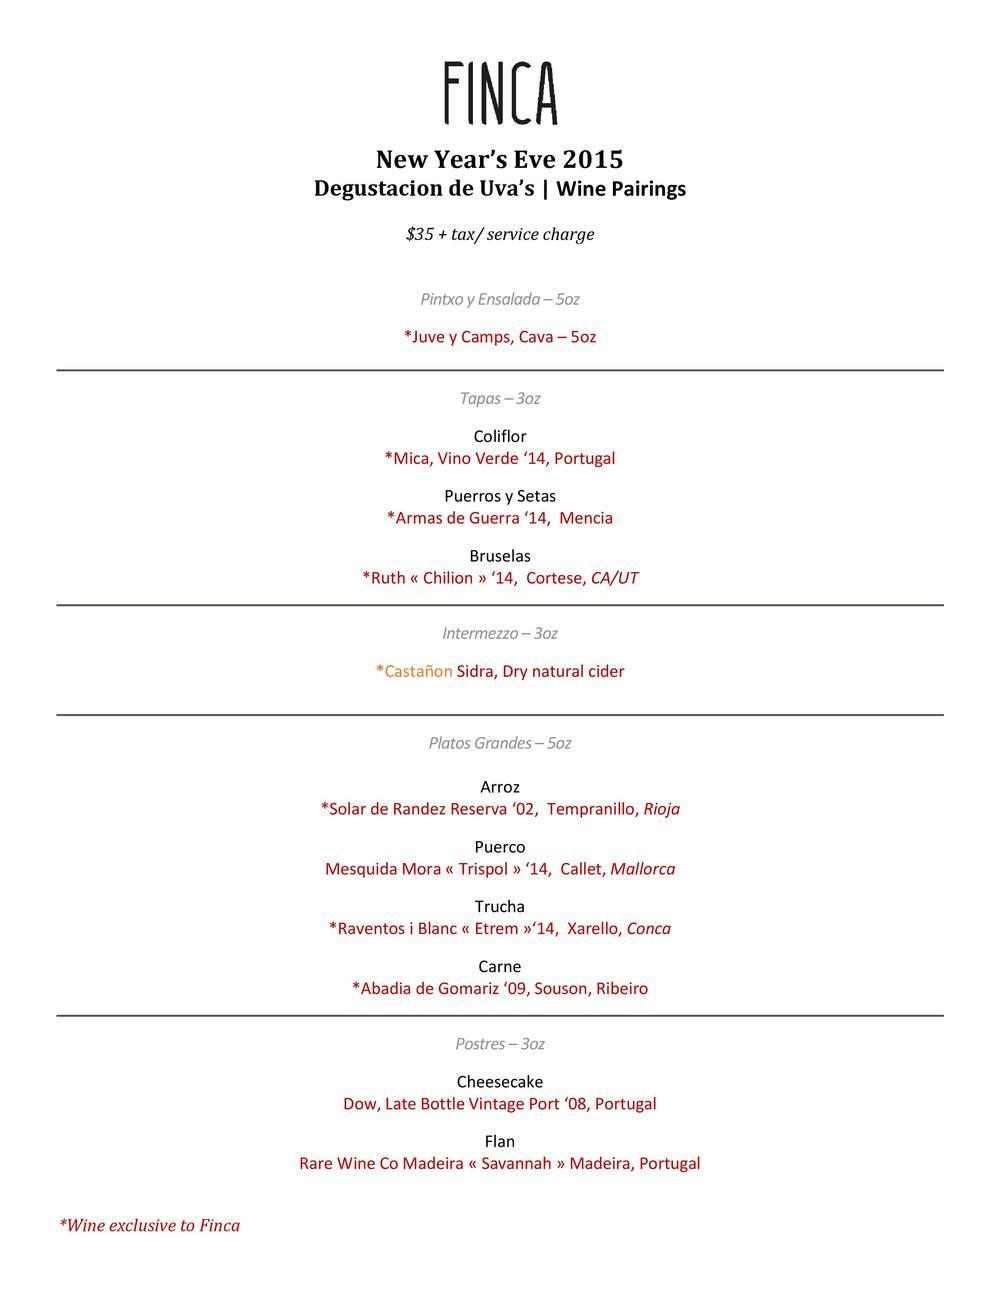 Finca NYE 2015 Pairings full page-page-001.jpg